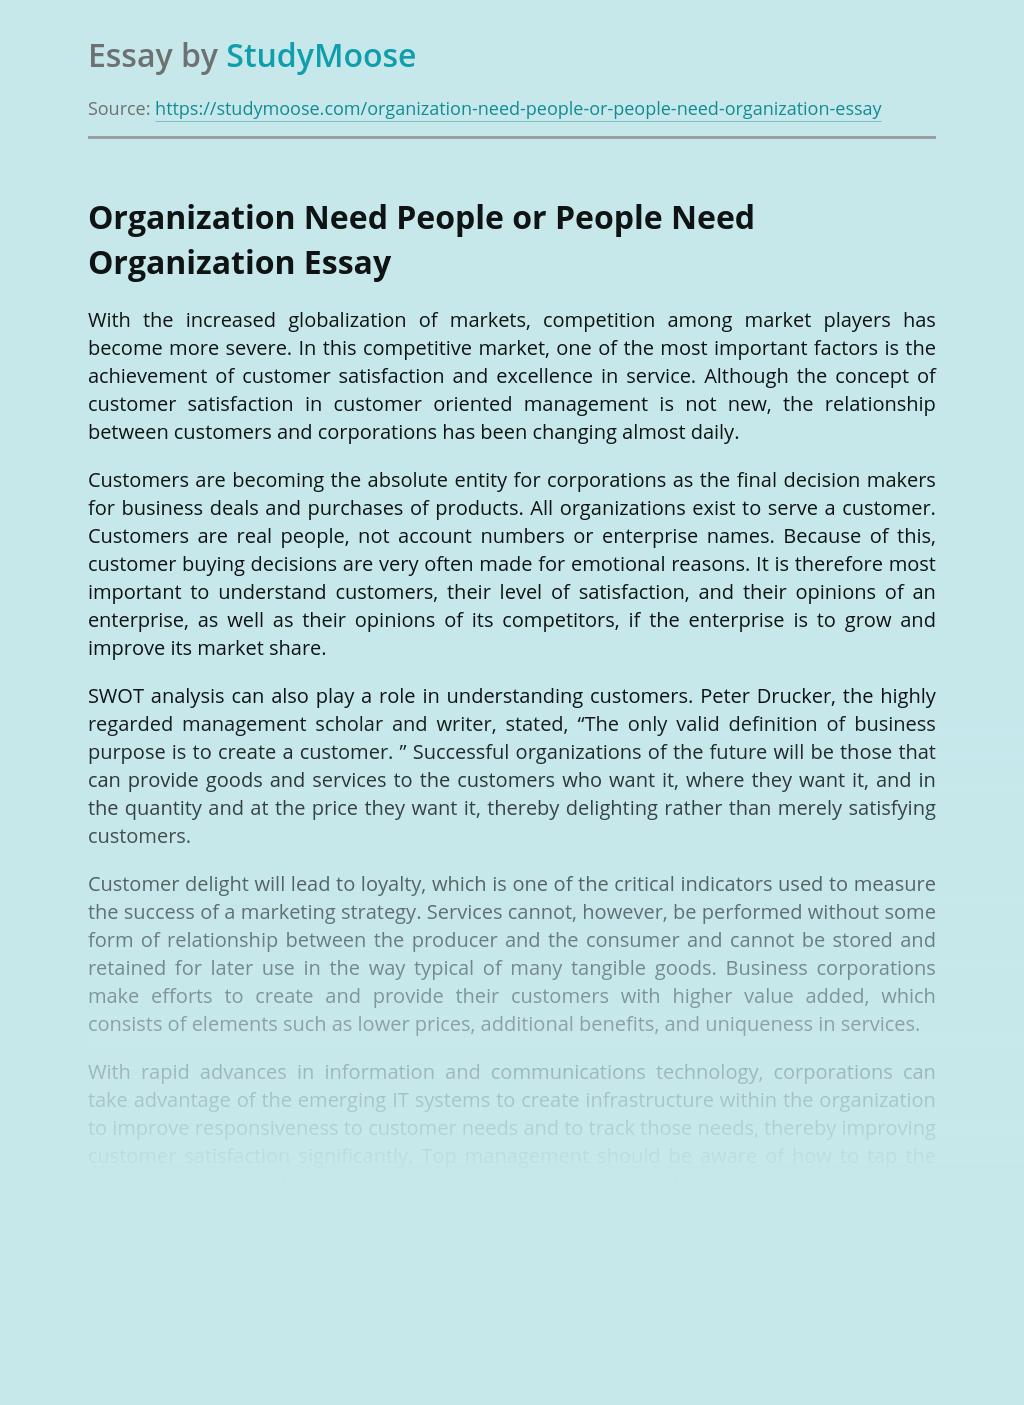 Organization Need People or People Need Organization